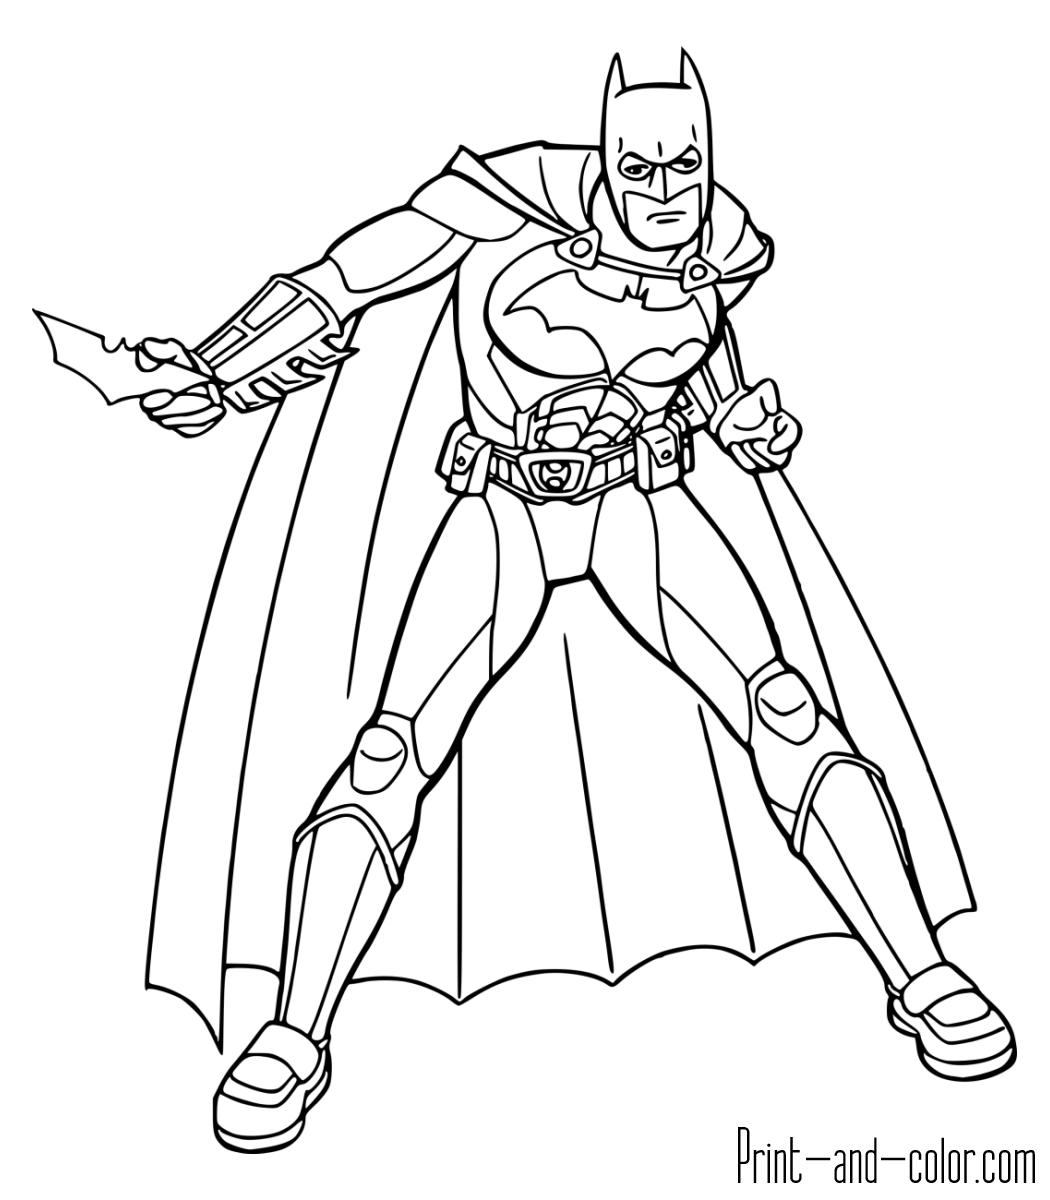 batman coloring sheets printable batman and his armor coloring pages hellokidscom sheets printable coloring batman